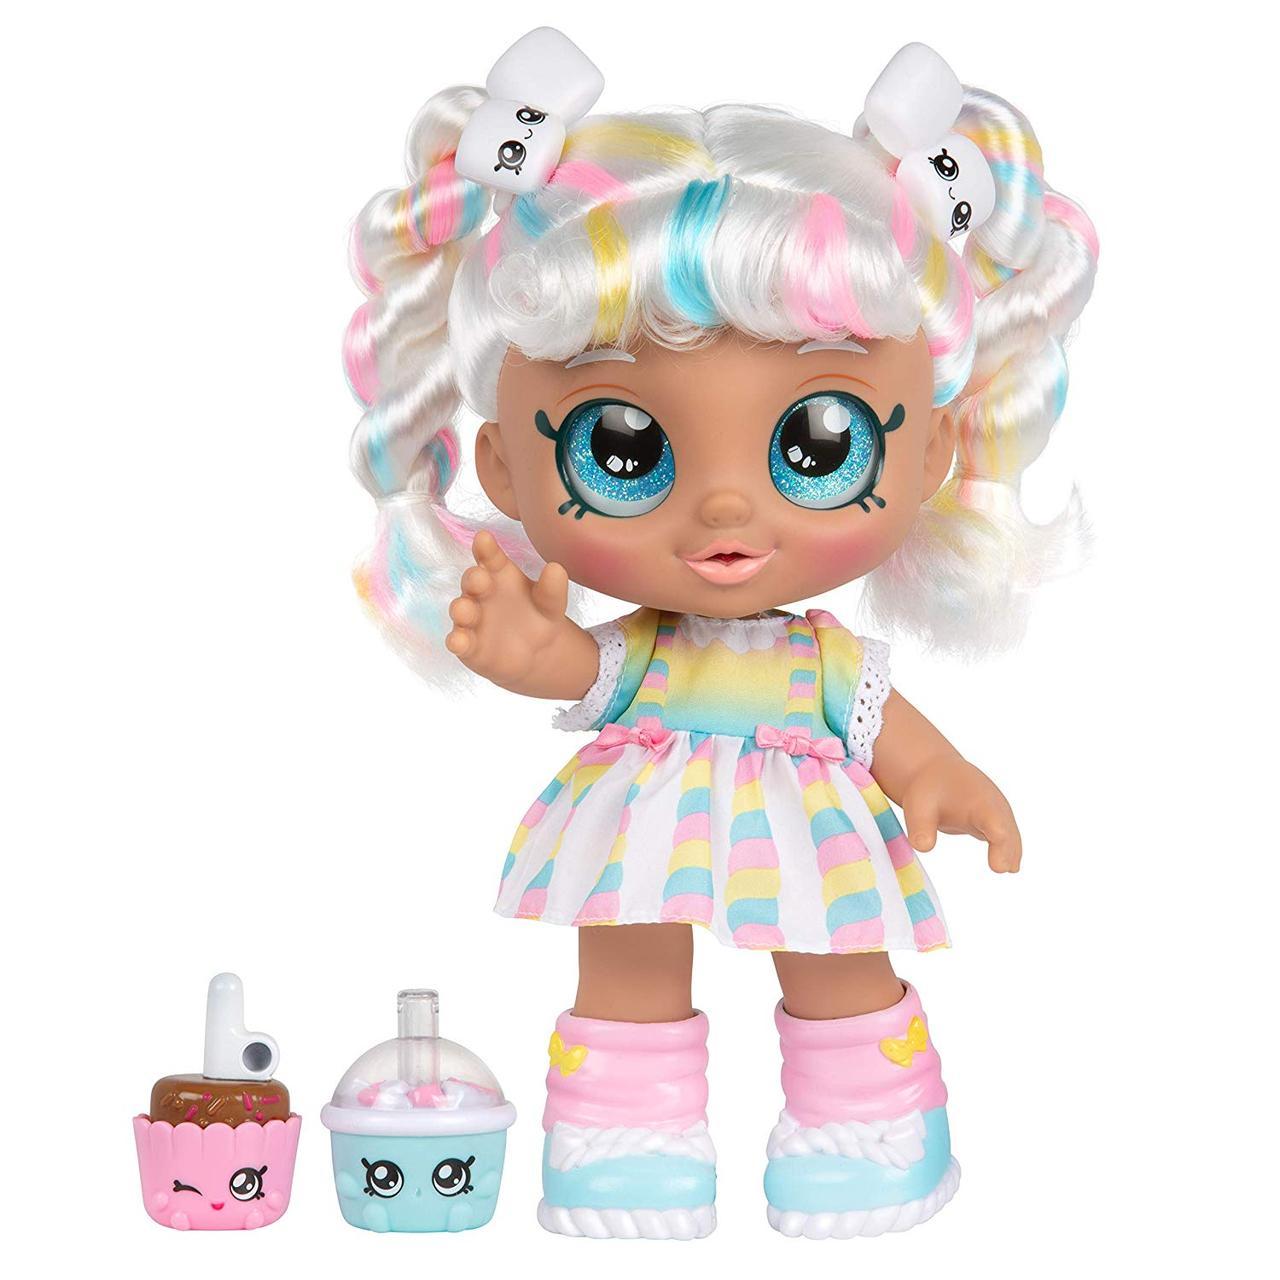 Кукла Марша Мелоу (зефирка) серии Kindi Kids Кинди Кидс с аксессуарами